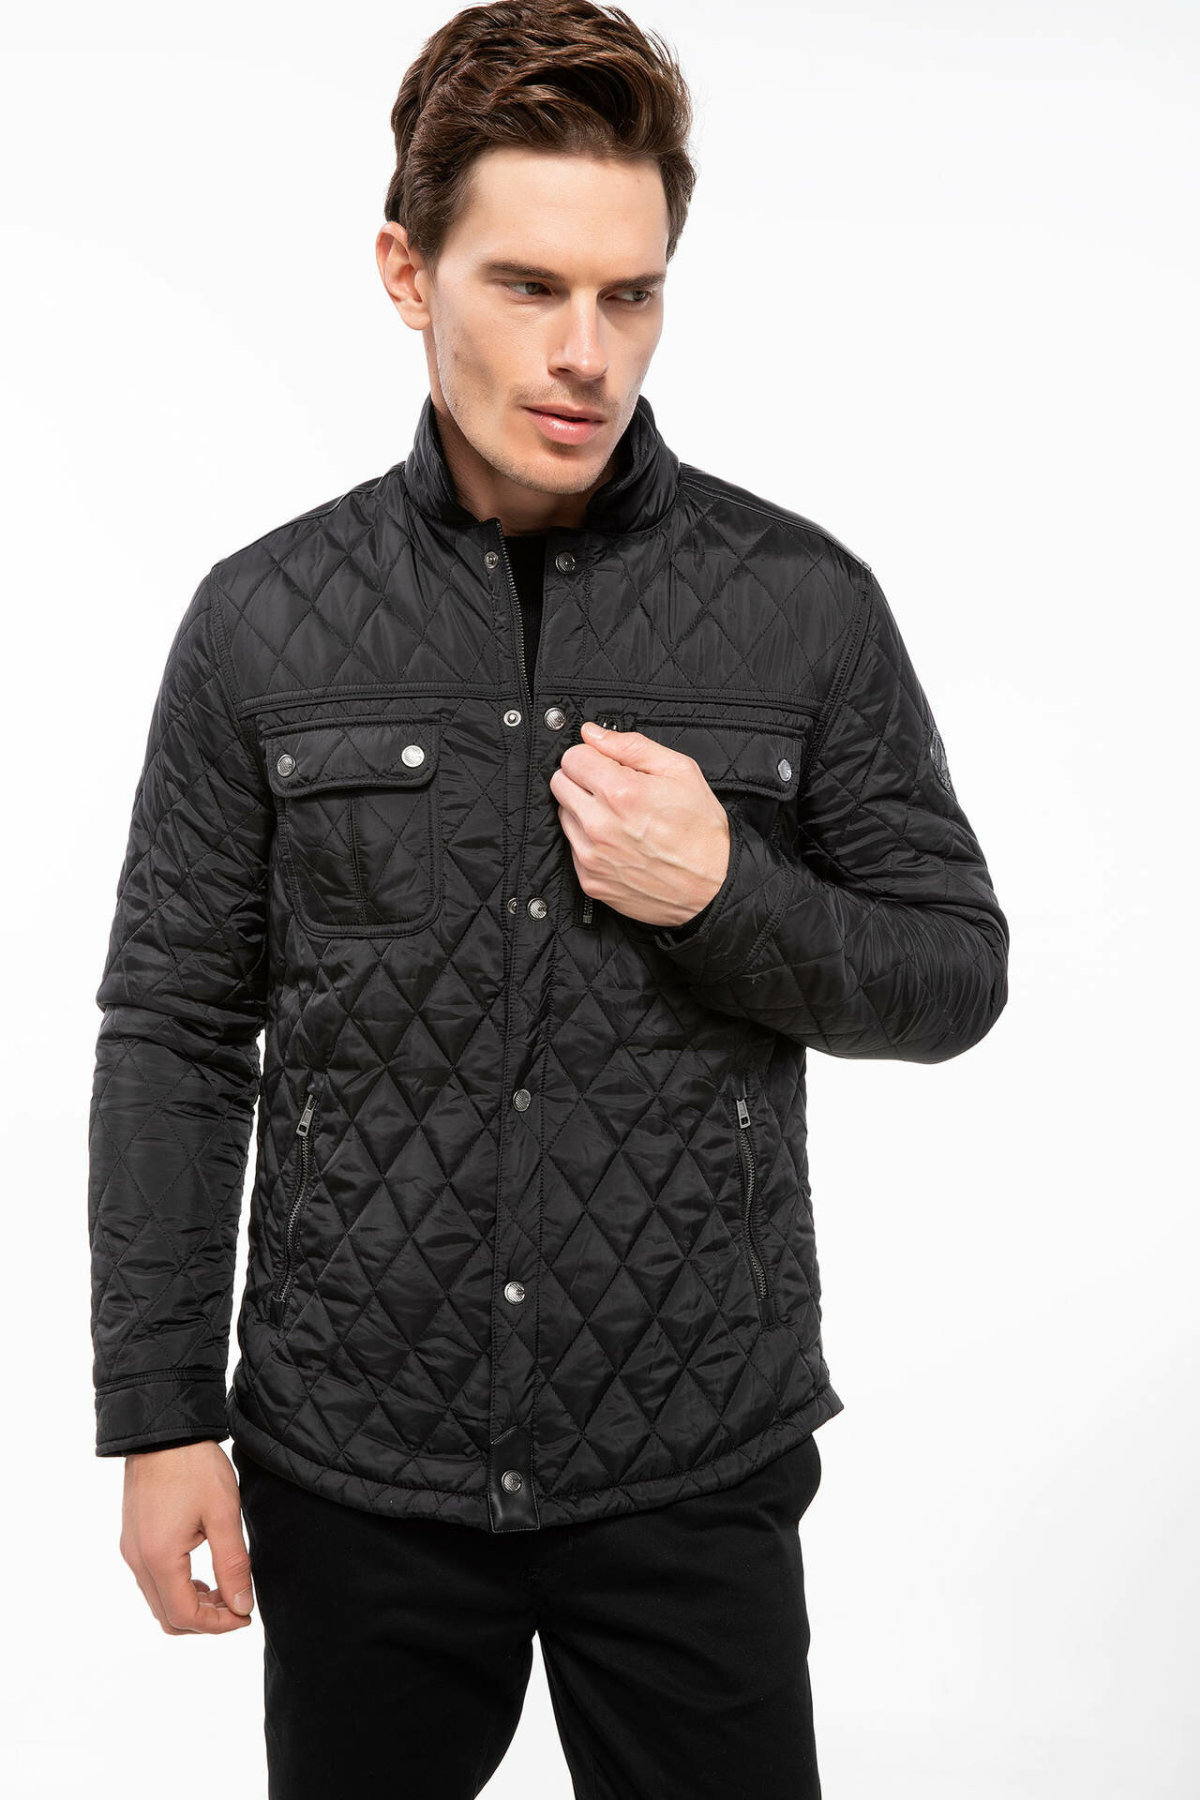 DeFacto Fashion New Men's Lapel Short Warm Parker Coats Male Solid Warm Jackets Men Thicken Overcoats Winter- I7987AZ18AU